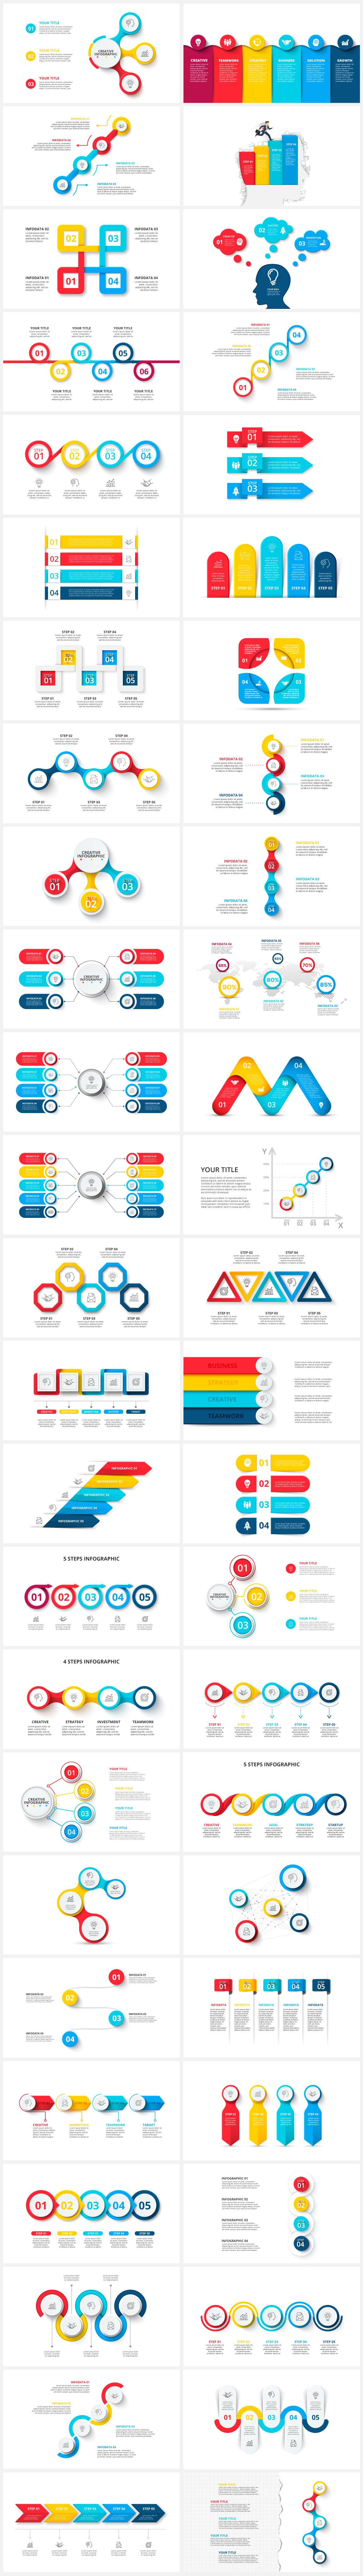 Multipurpose Infographics PowerPoint Templates v.5.0 - 115